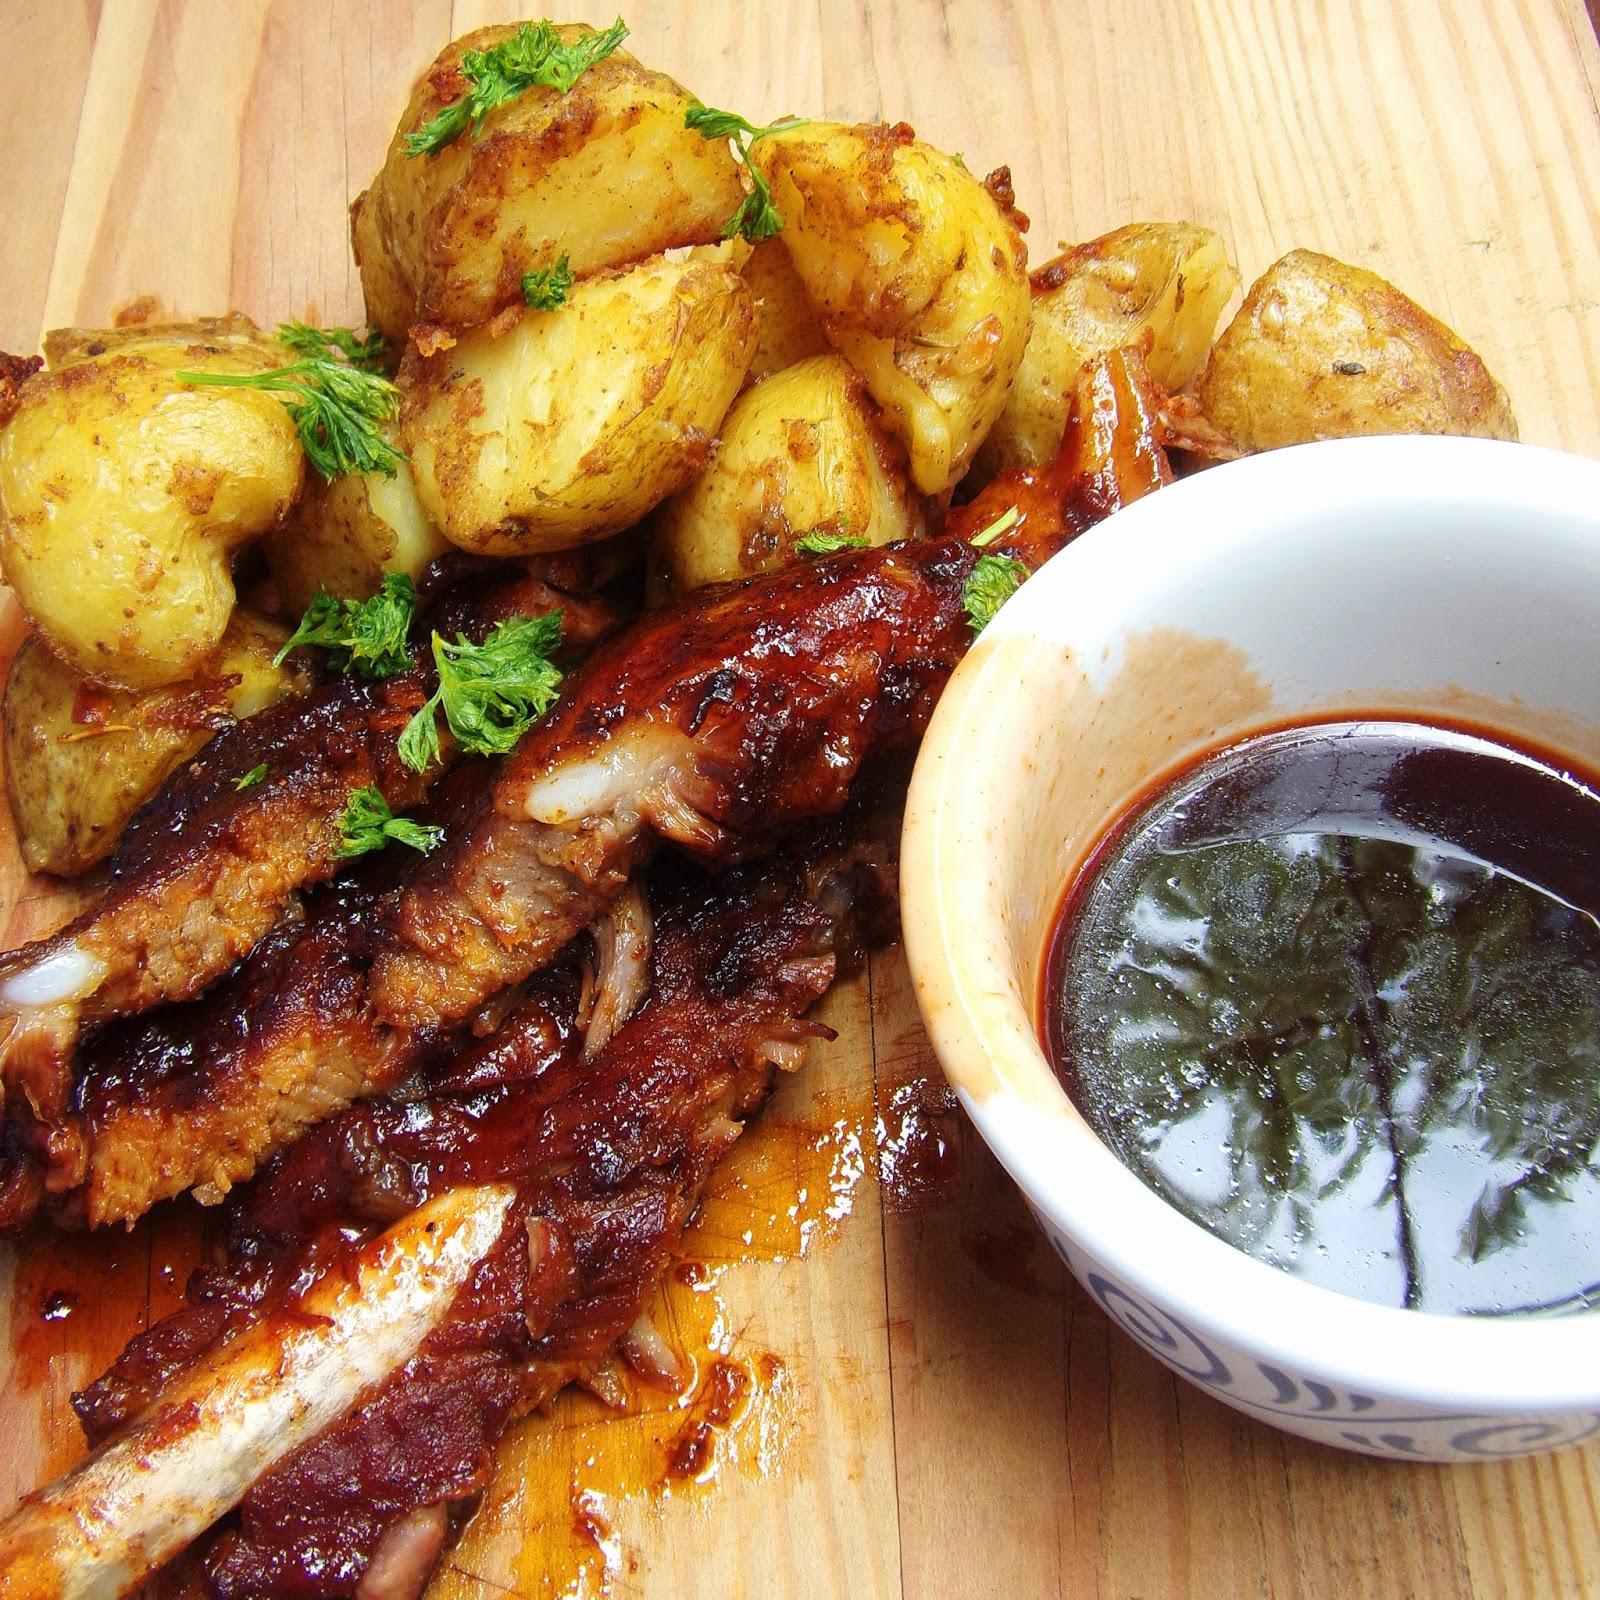 pork ribs recipe, recipe for pork ribs, baked pork ribs,